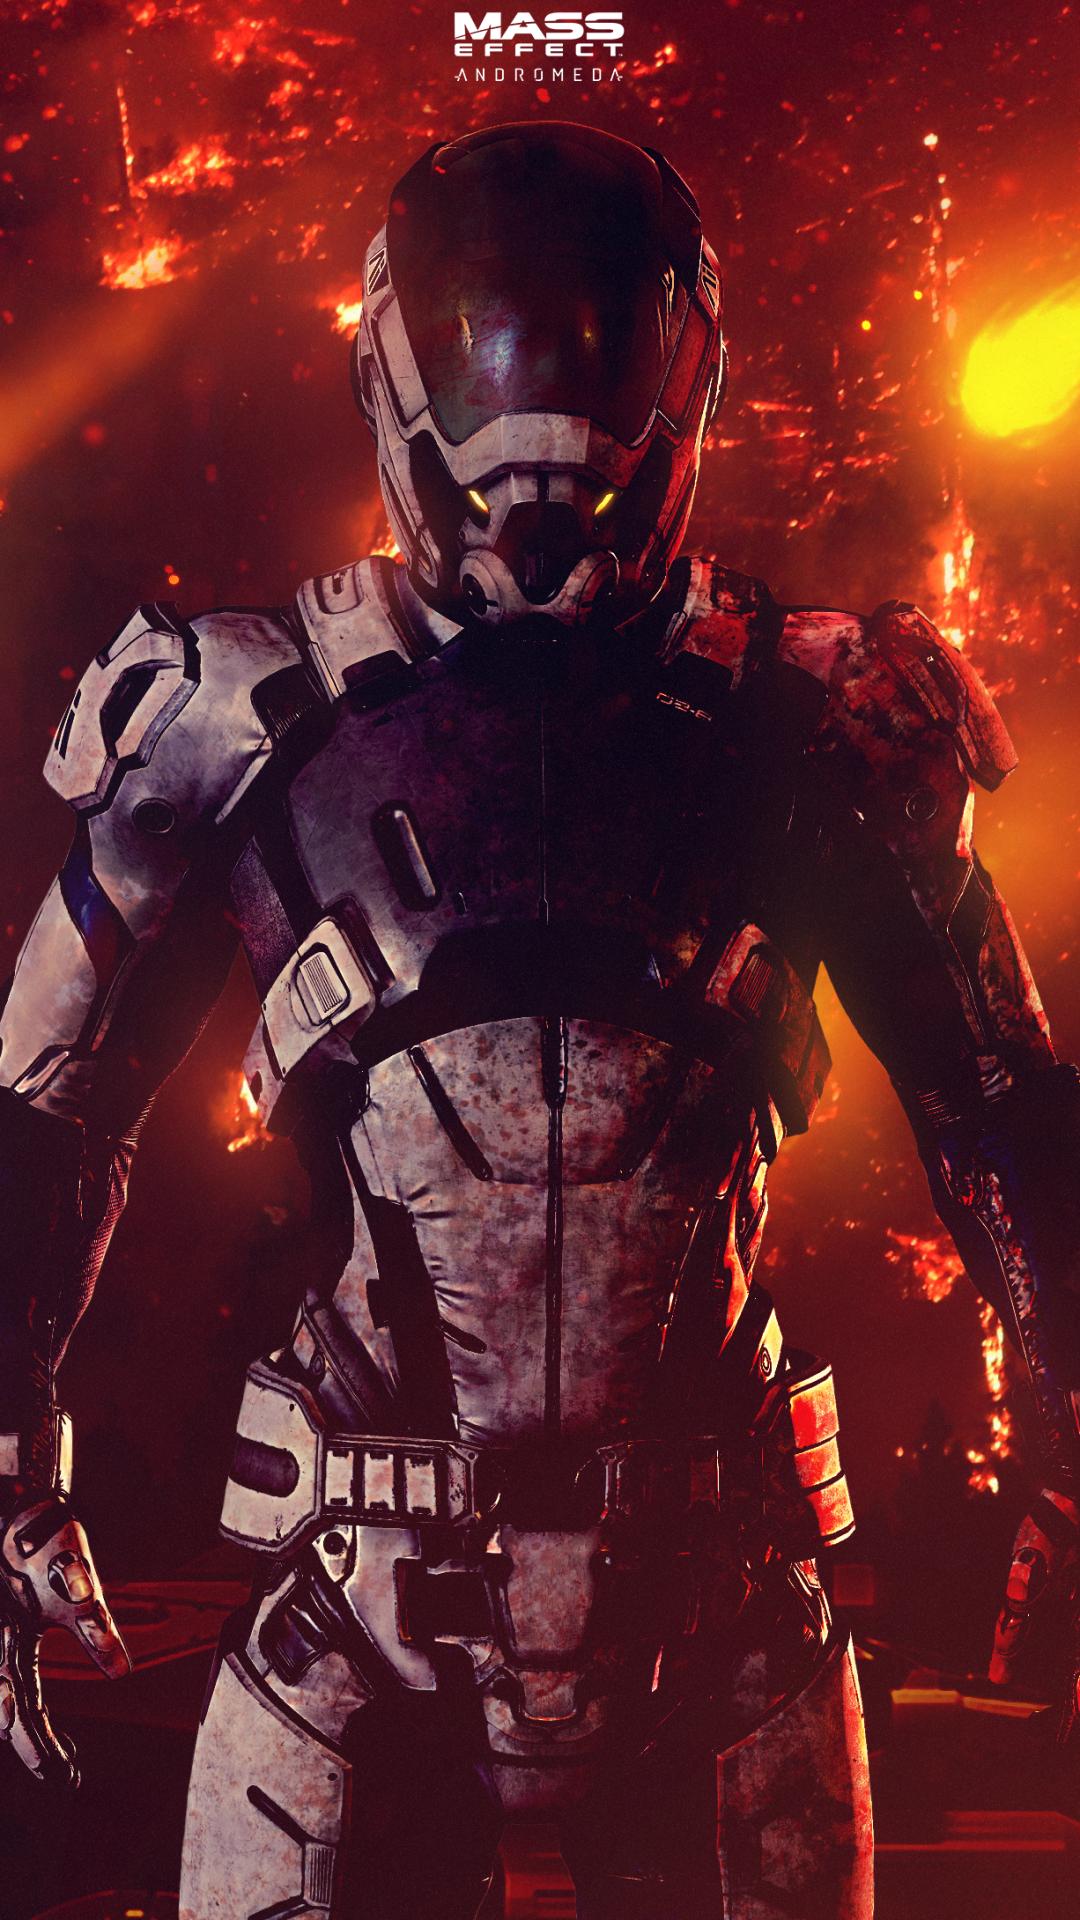 Mass Effect Hd Wallpapers Backgrounds Wallpaper Mass Effect Mass Effect Ships Mass Effect Characters